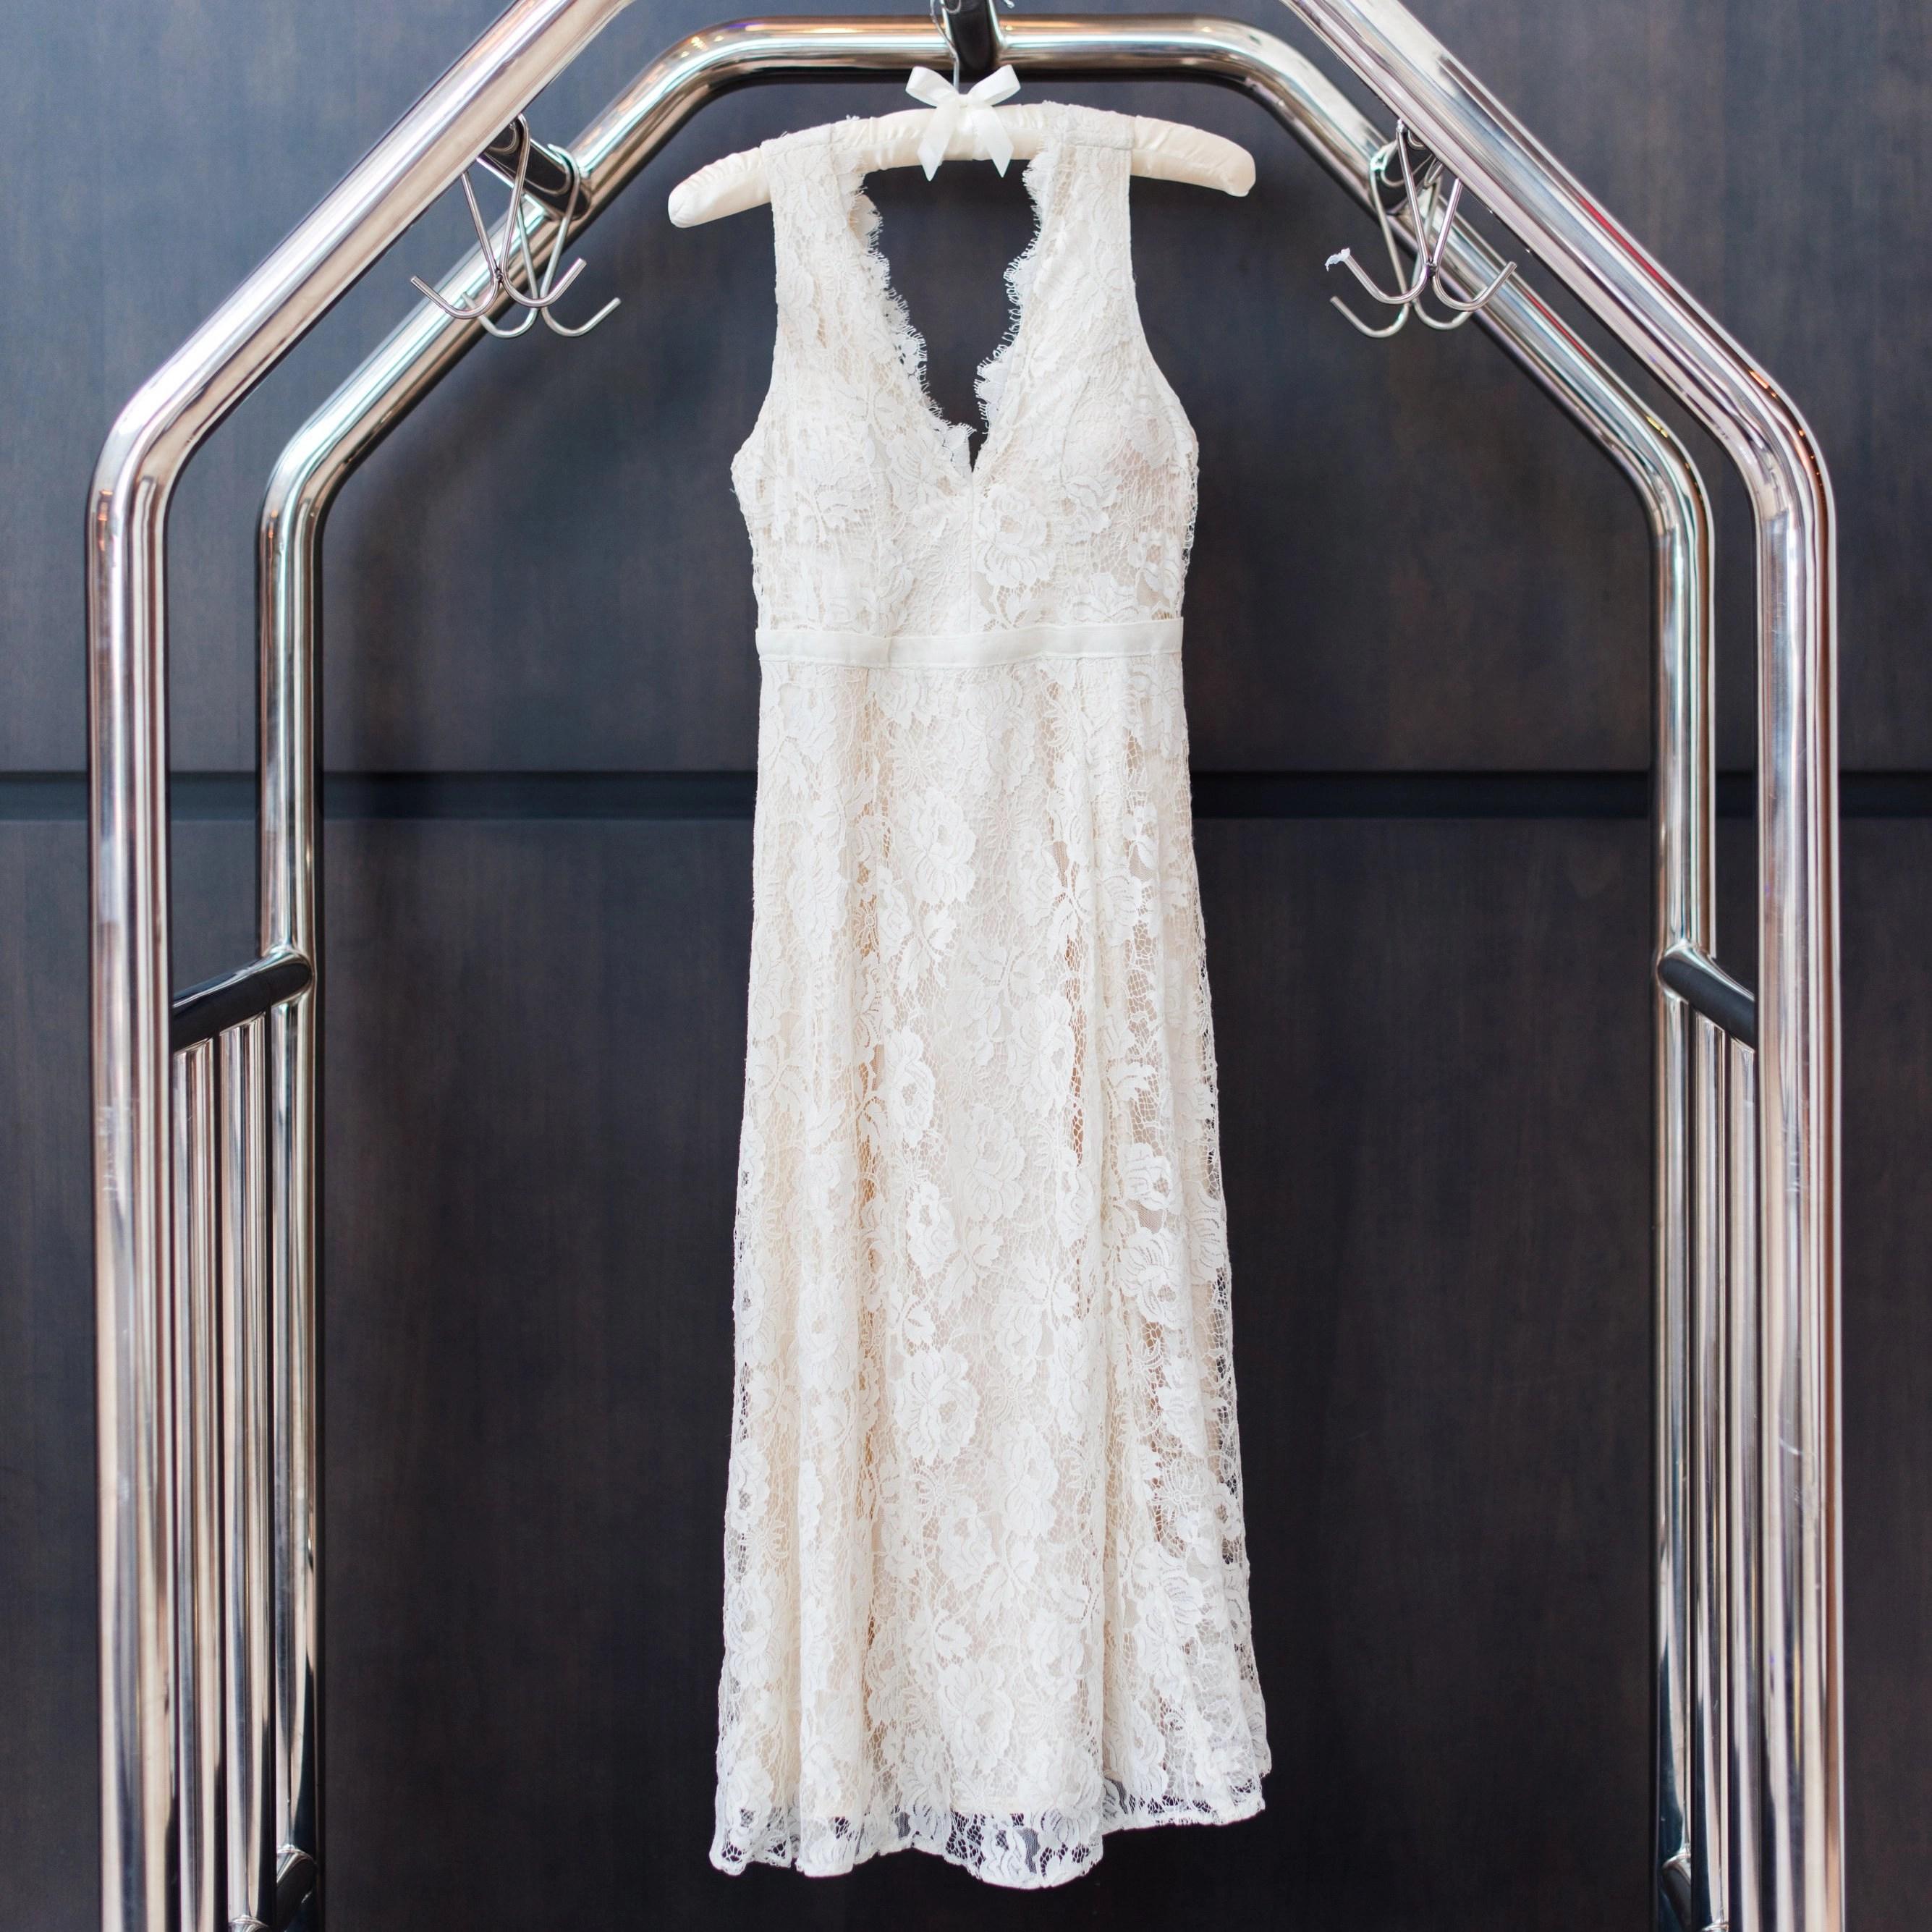 Erin's wedding dress